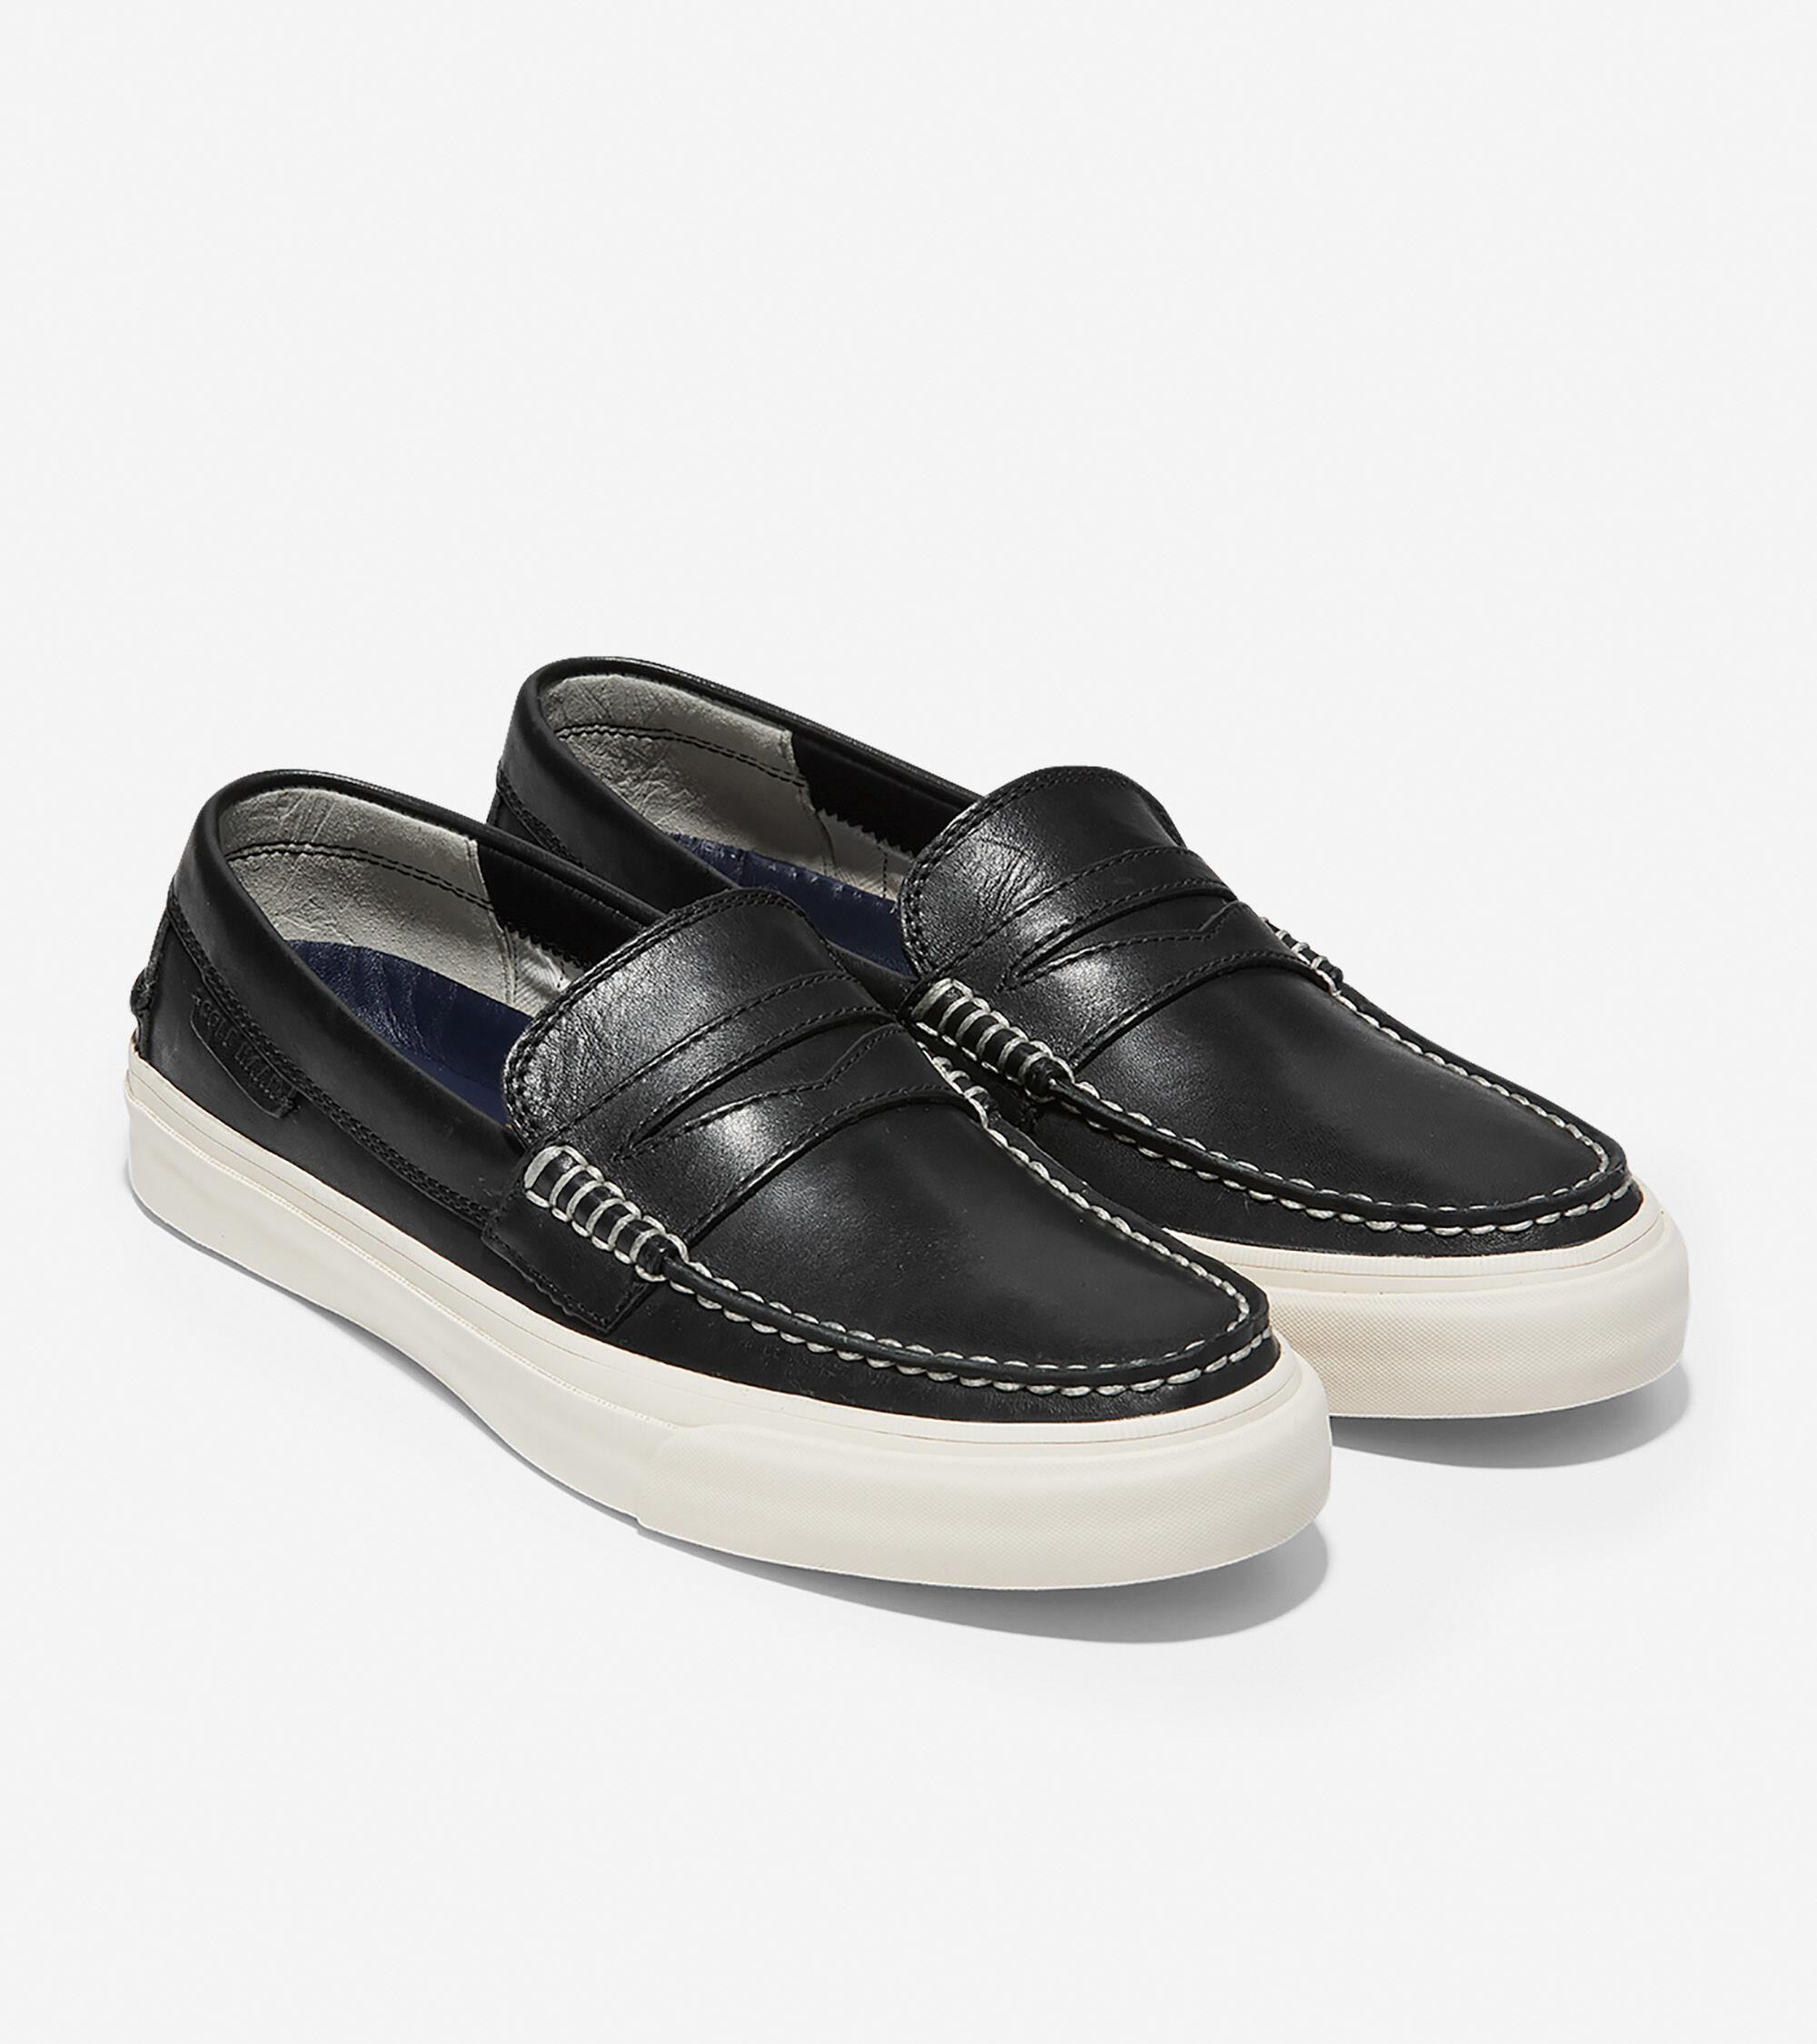 dea6ae6edc7 Men s Pinch Weekender LX Penny Loafers in Black-White